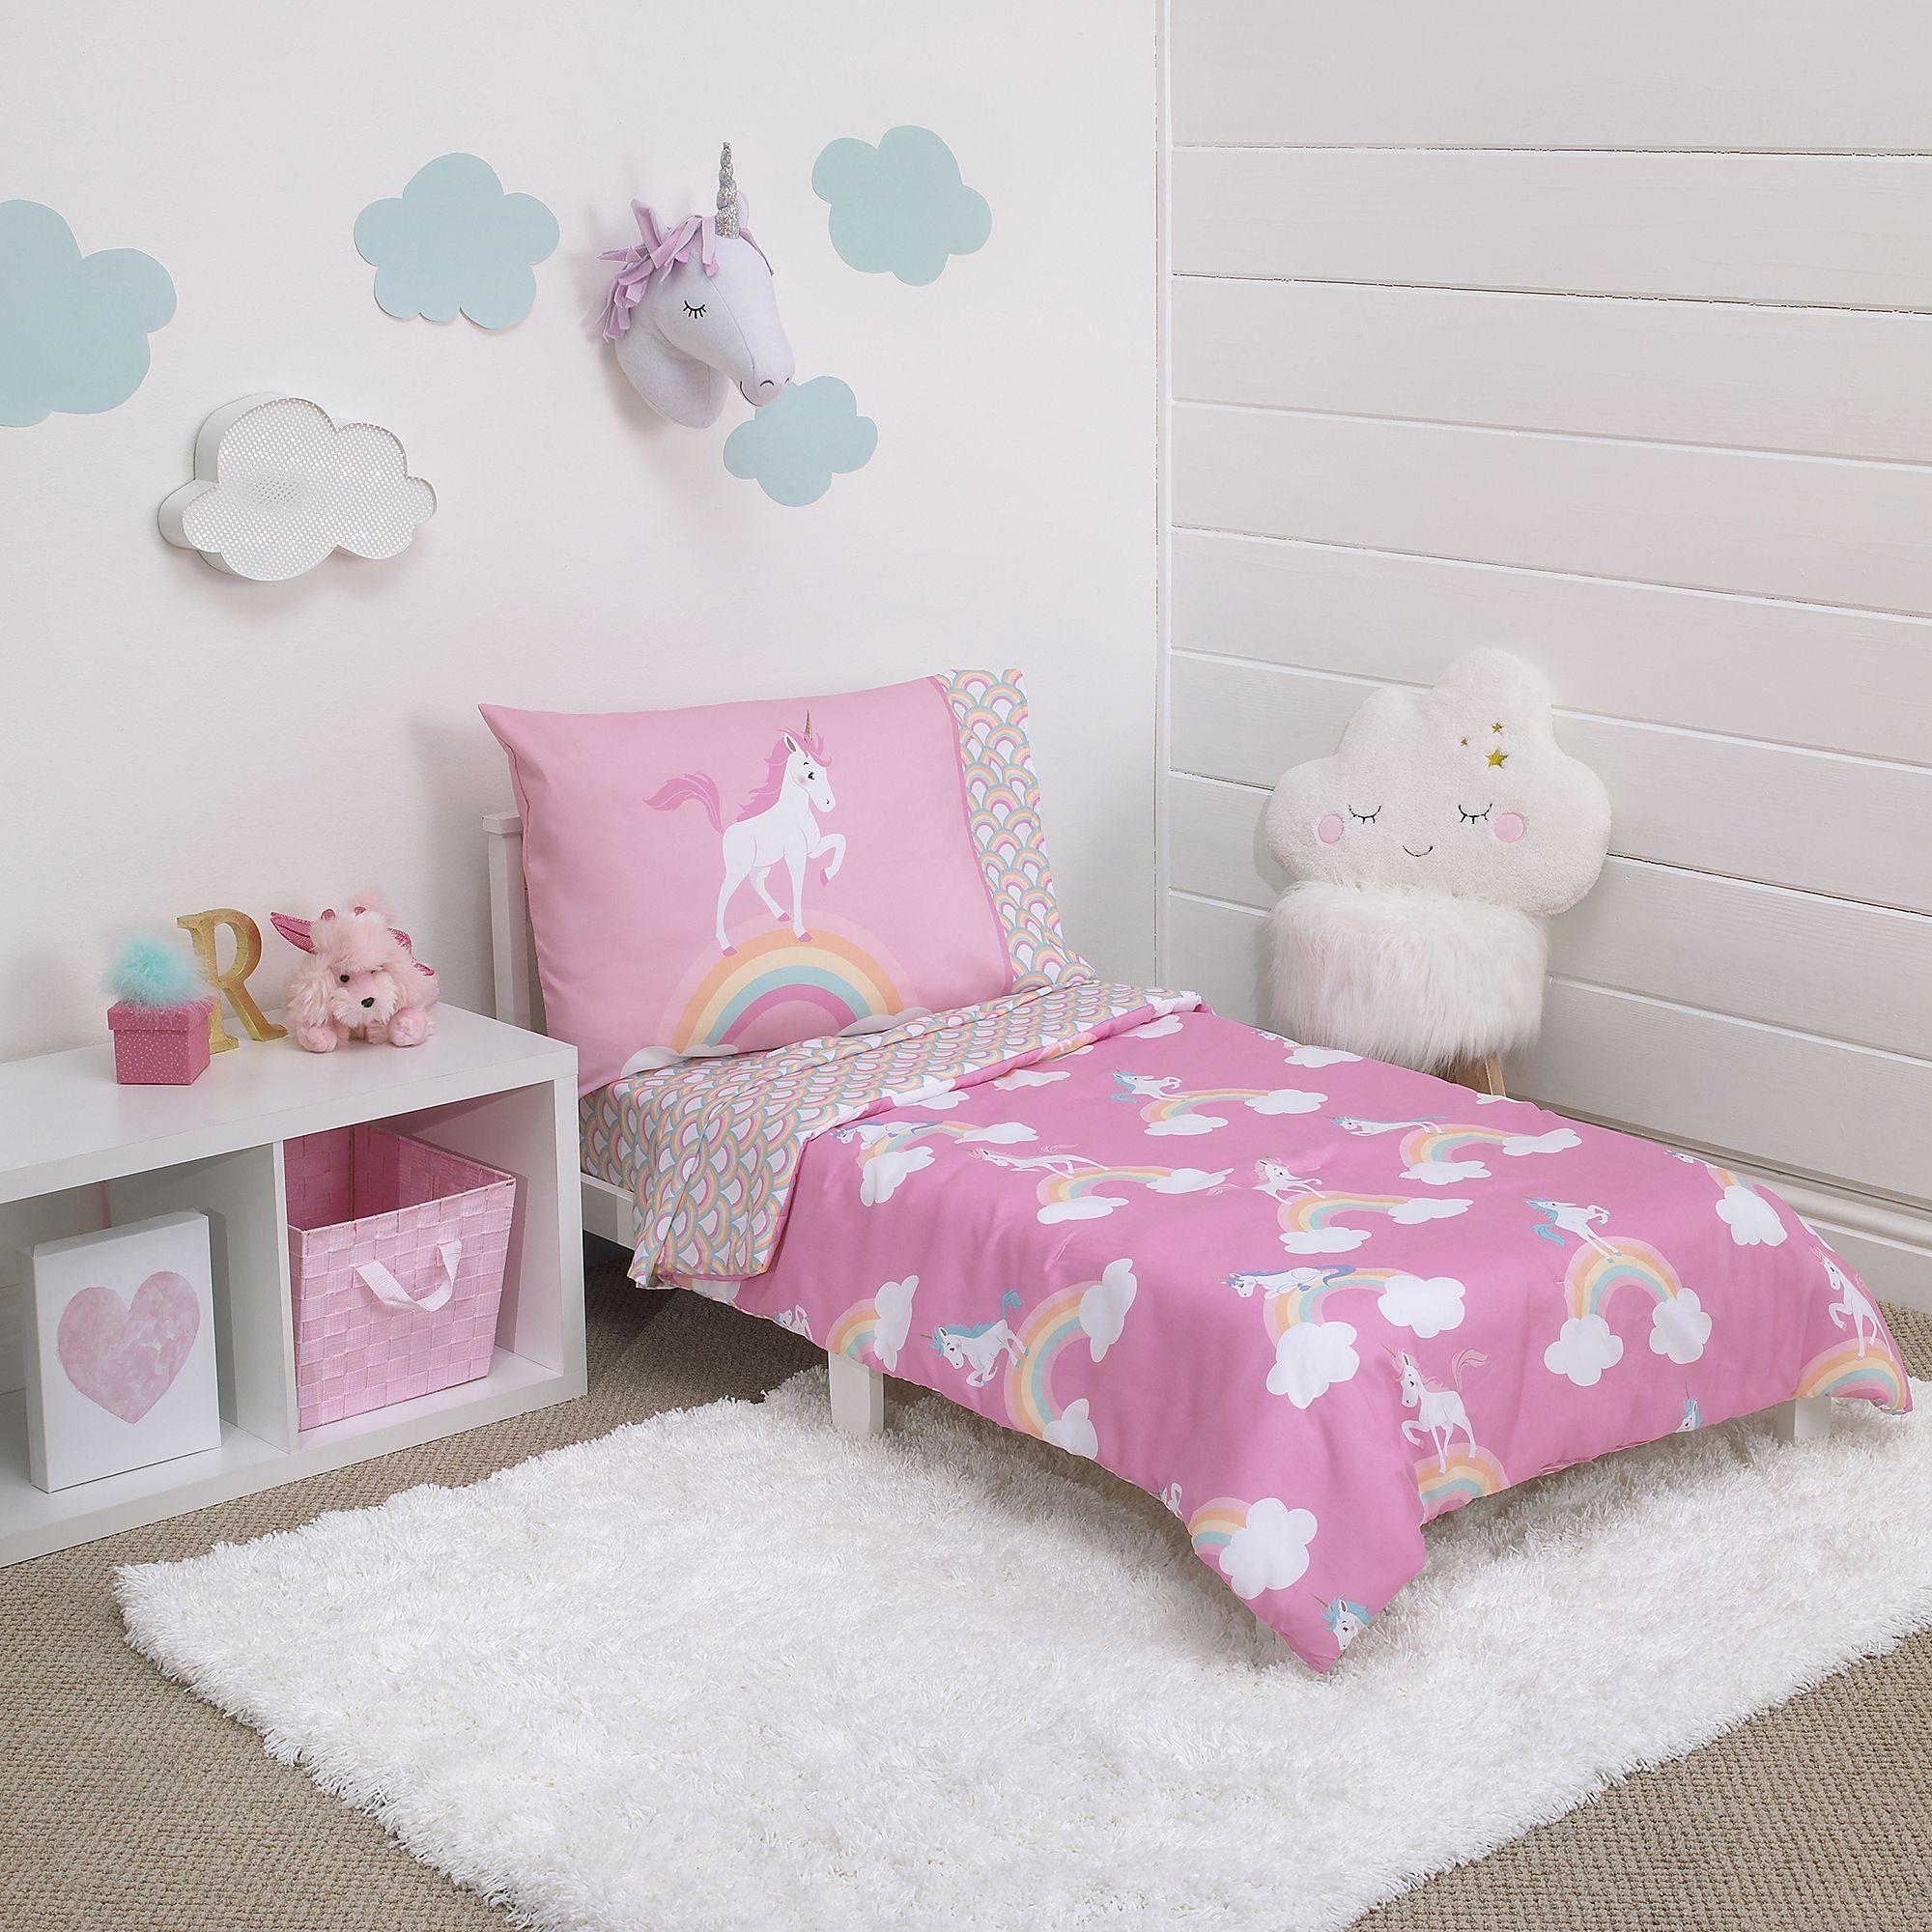 Best Little Tikes Rainbows And Unicorns 4 Piece Toddler Bedding 400 x 300